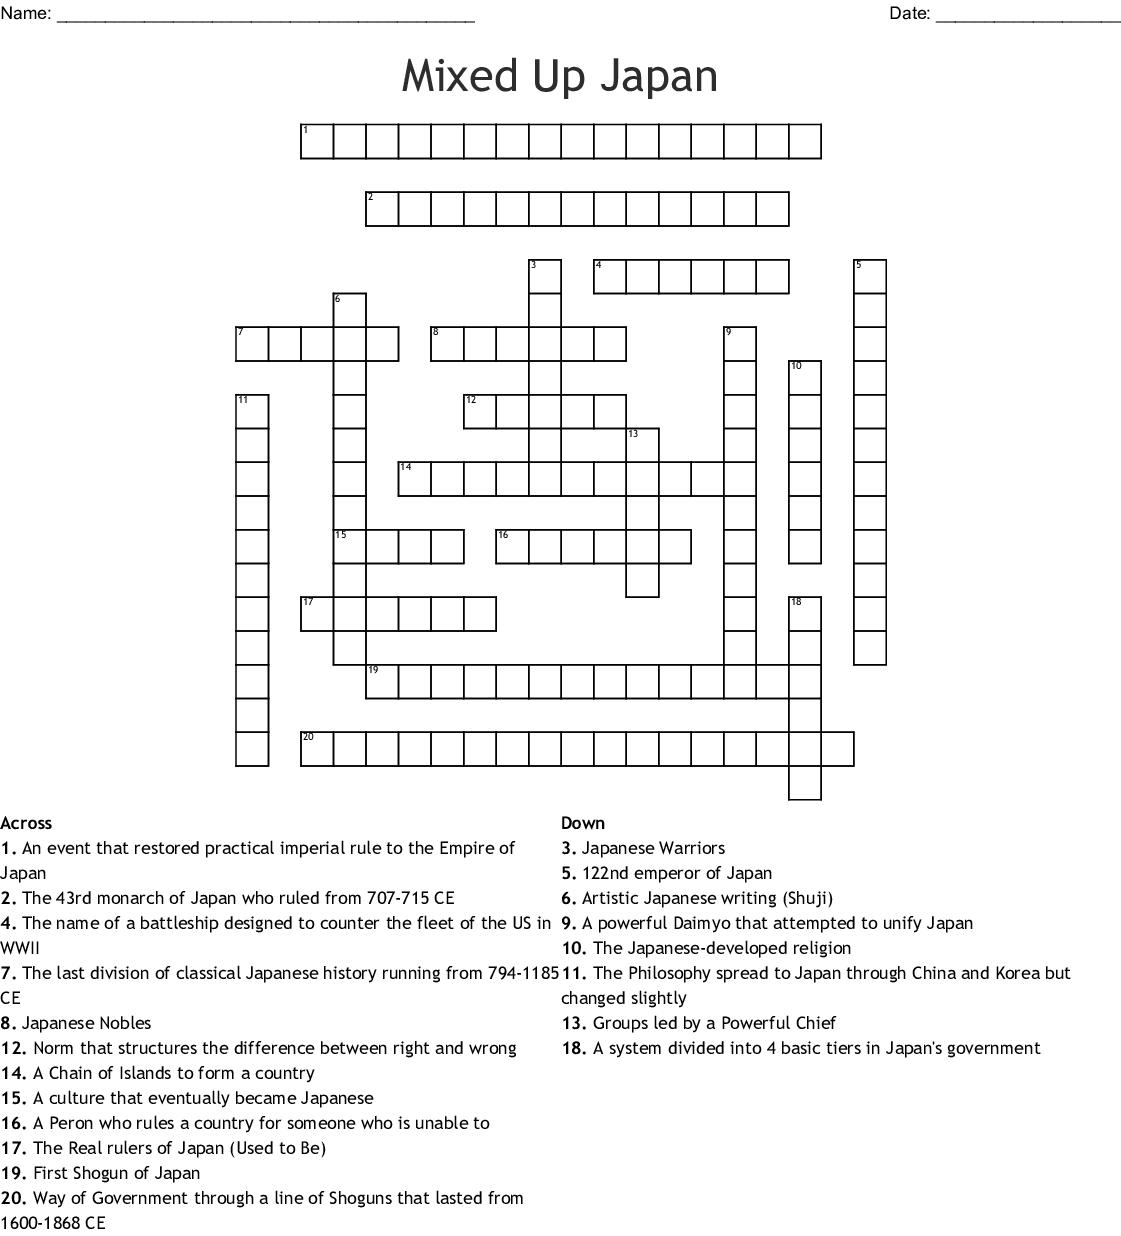 Mixed Up Japan Crossword